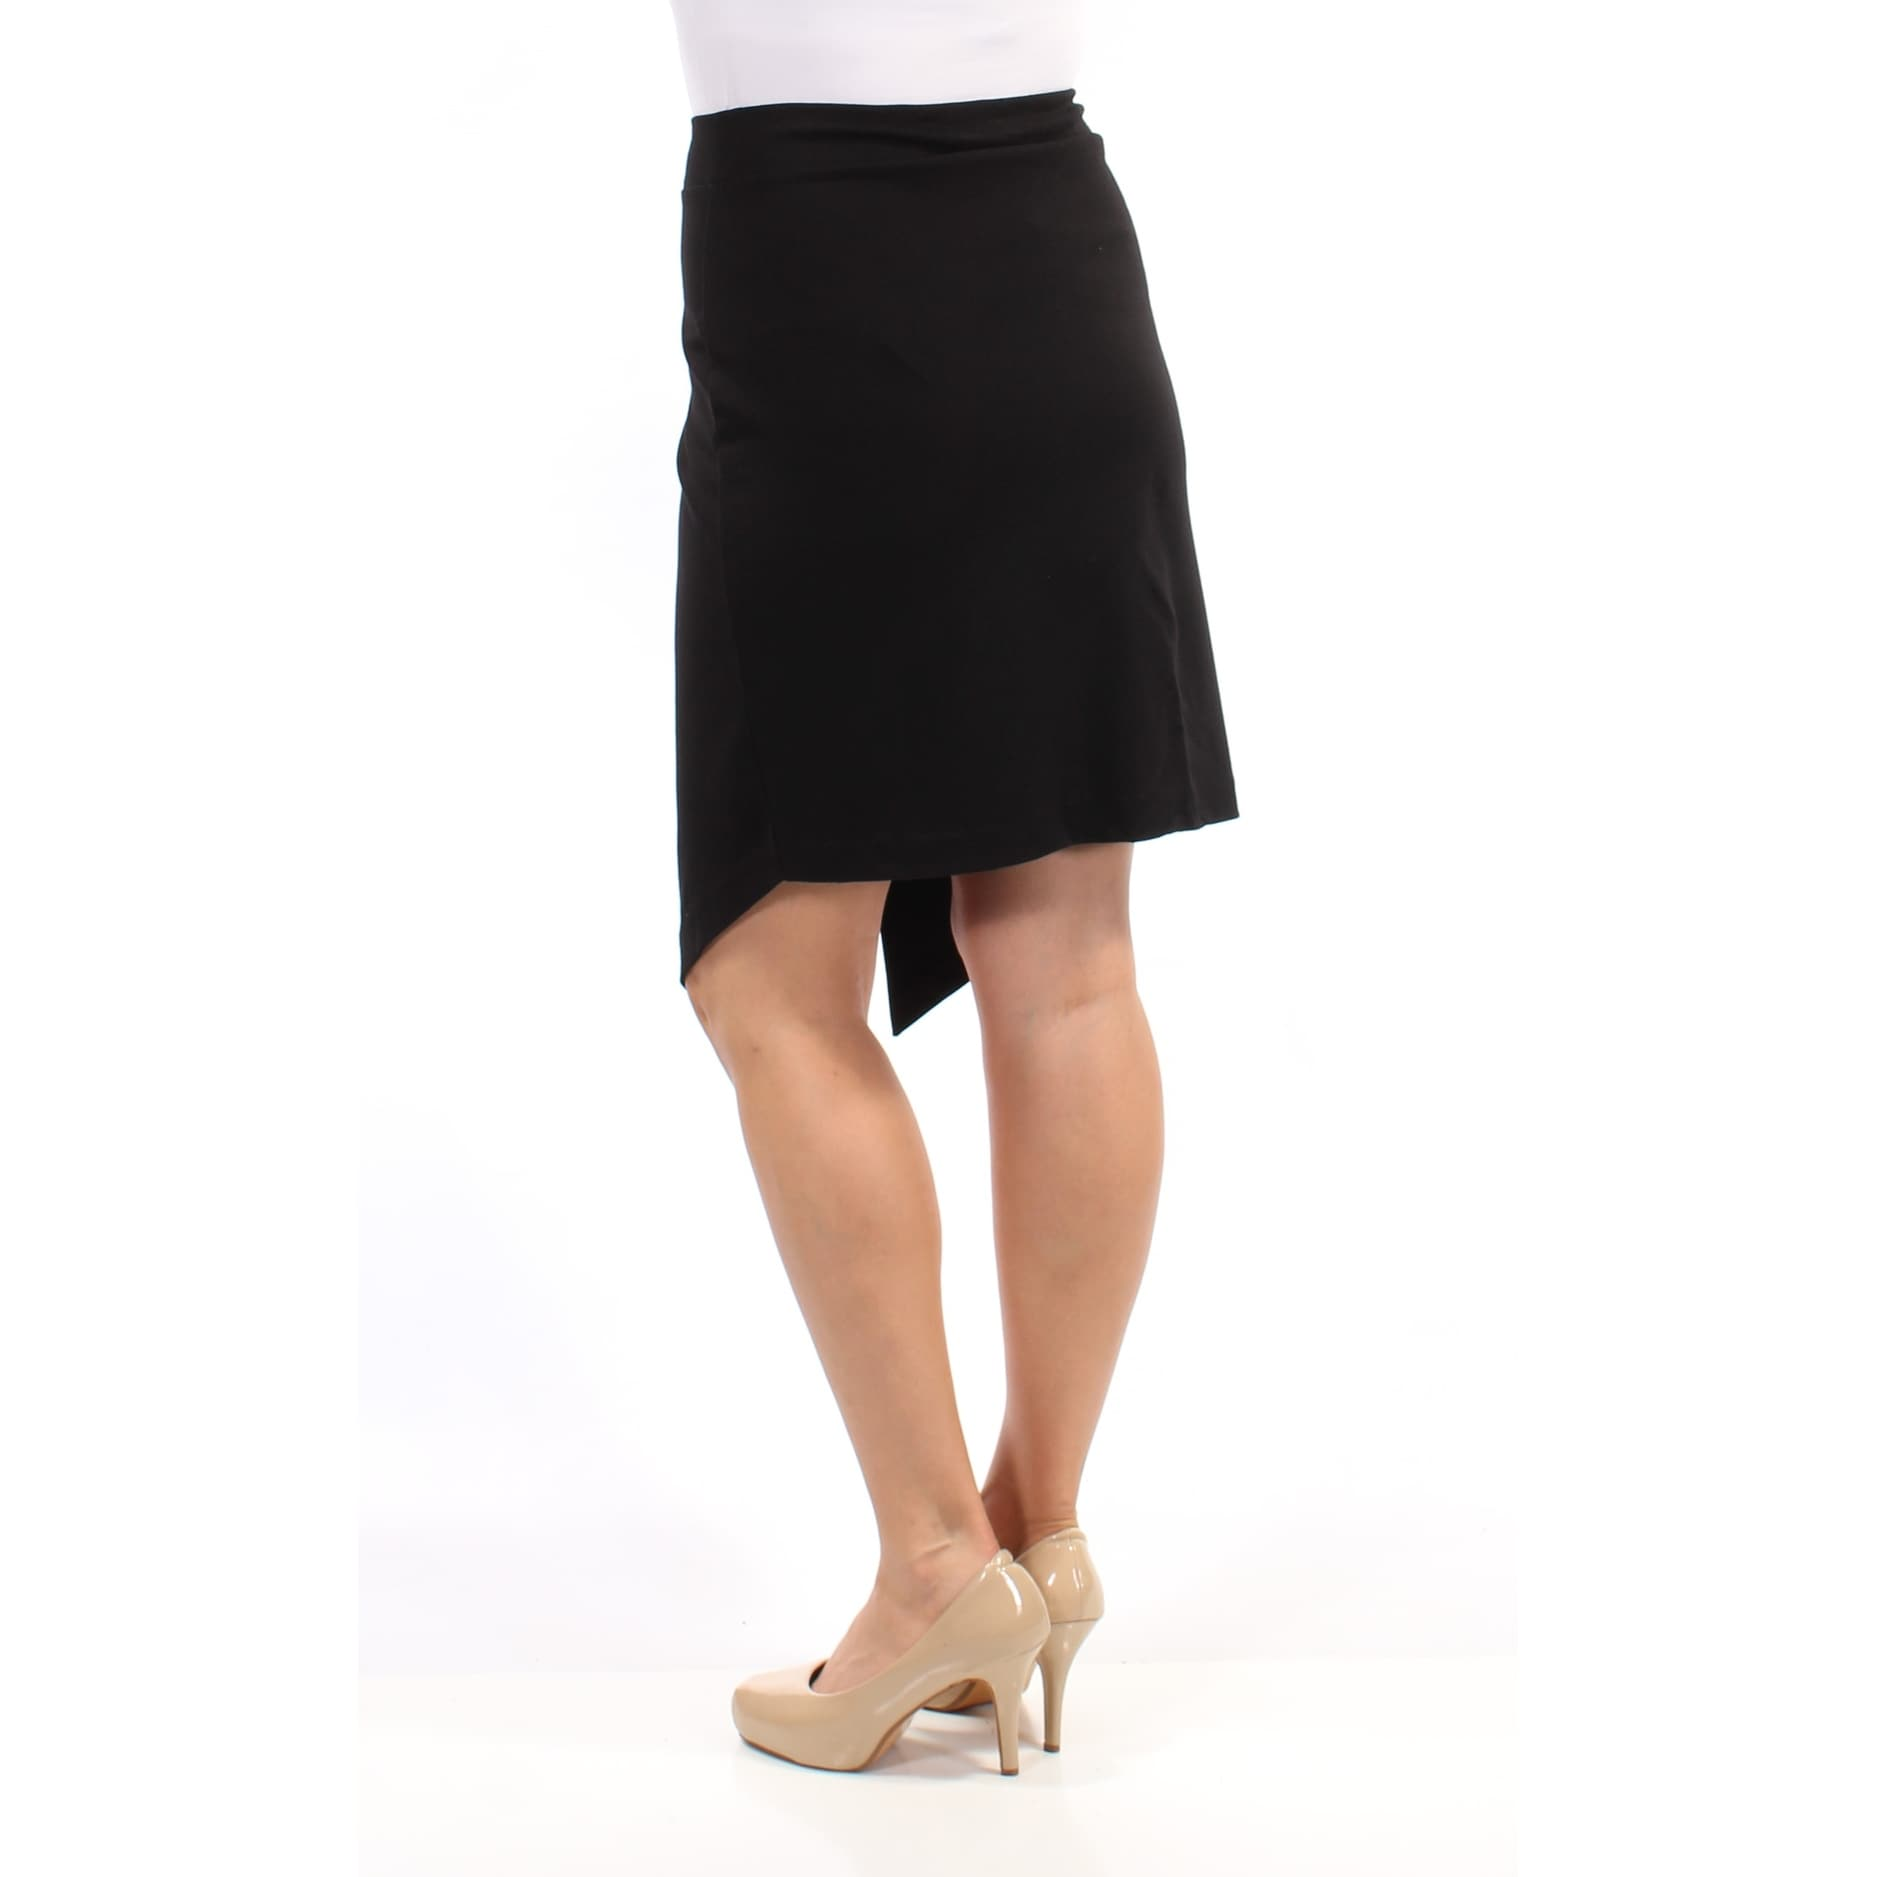 ee5d004e175fd3 Shop KENSIE Womens Black Envelope-hem Ponte Below The Knee Pencil Wear To Work  Skirt Size: L - On Sale - Free Shipping On Orders Over $45 - Overstock - ...